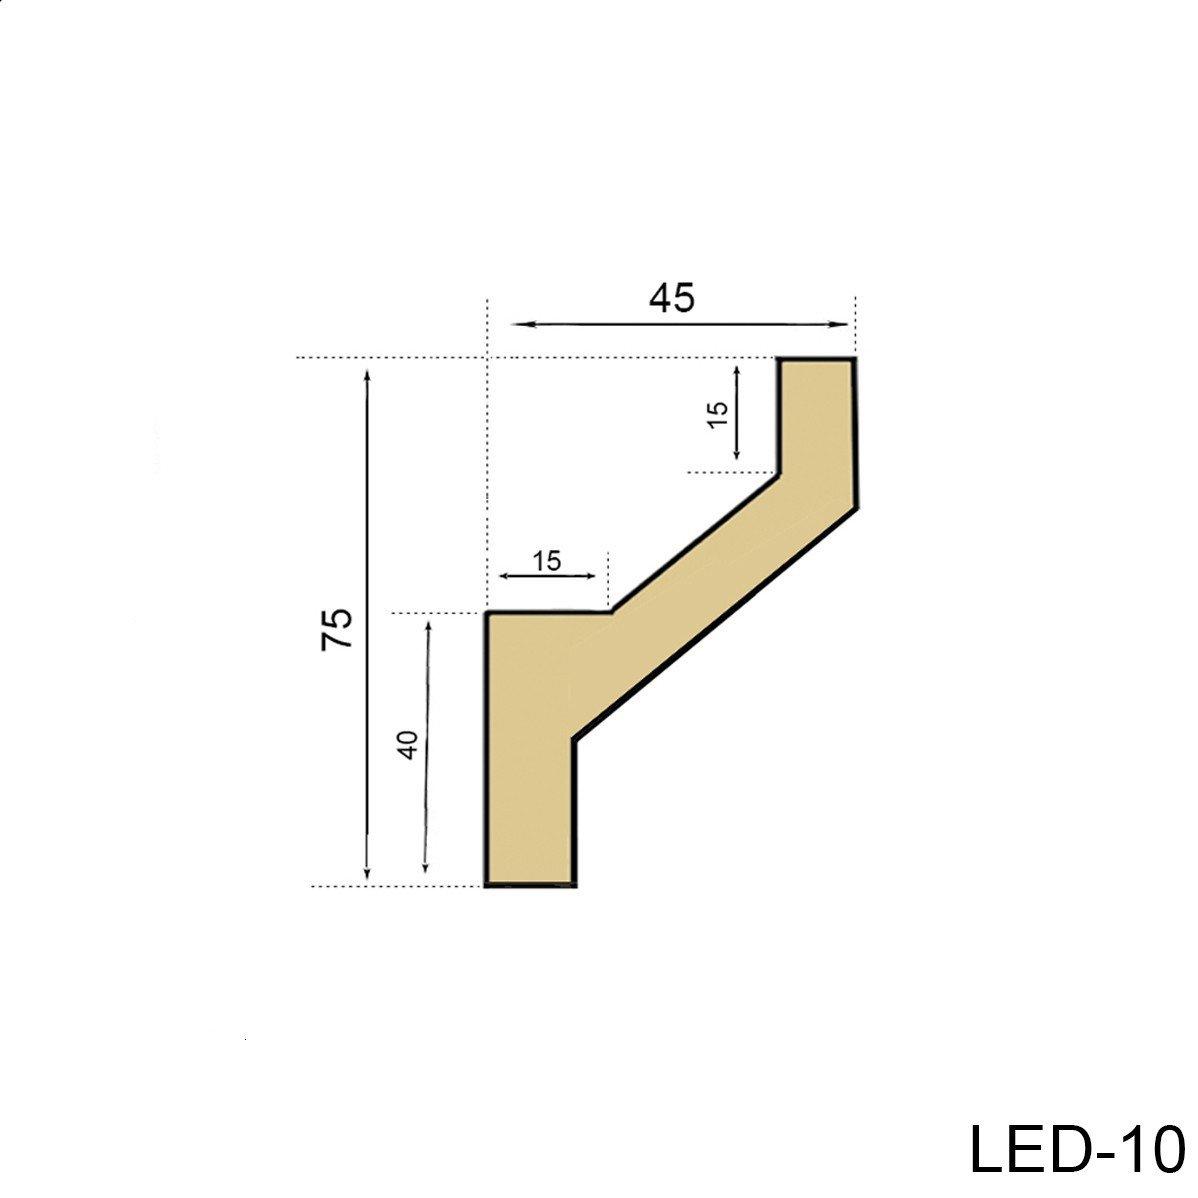 20 Meter PU Stuckprofil Stuckleiste Lichtleiste LED Stuck sto/ßfest 75x45 LED-10